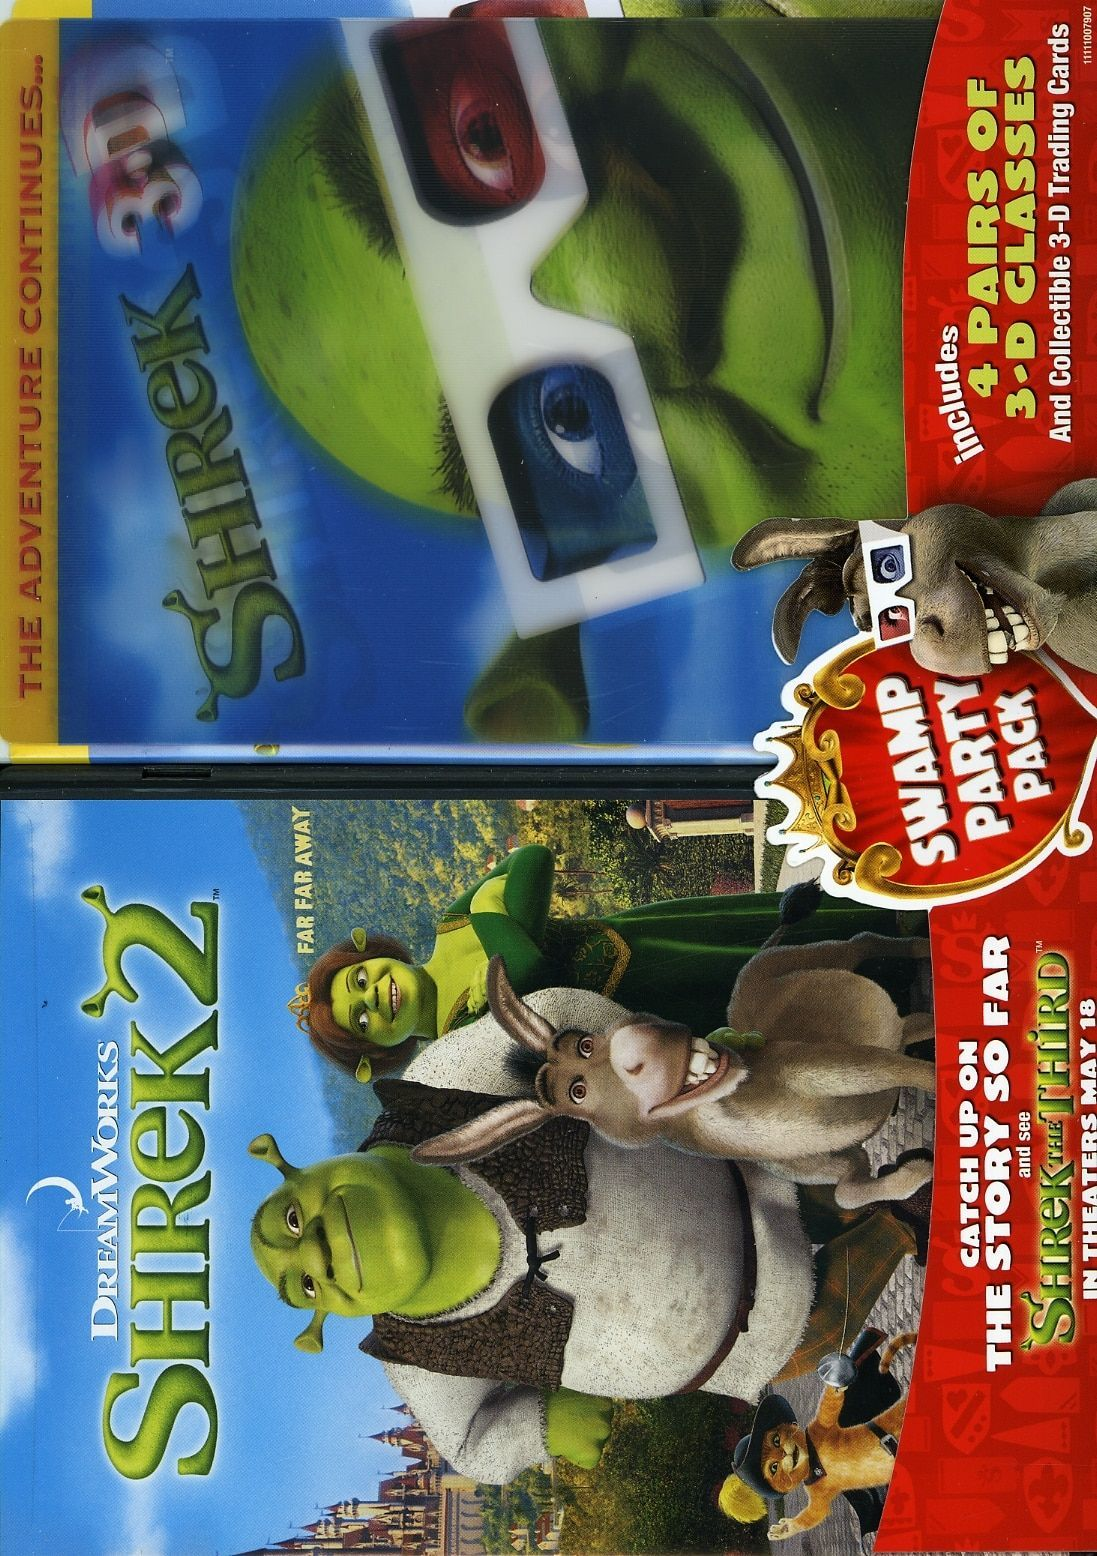 Paramount Studios Shrek 2 Shrek 3d Party In The Swamp 2 Pack Shrek Party Swamp